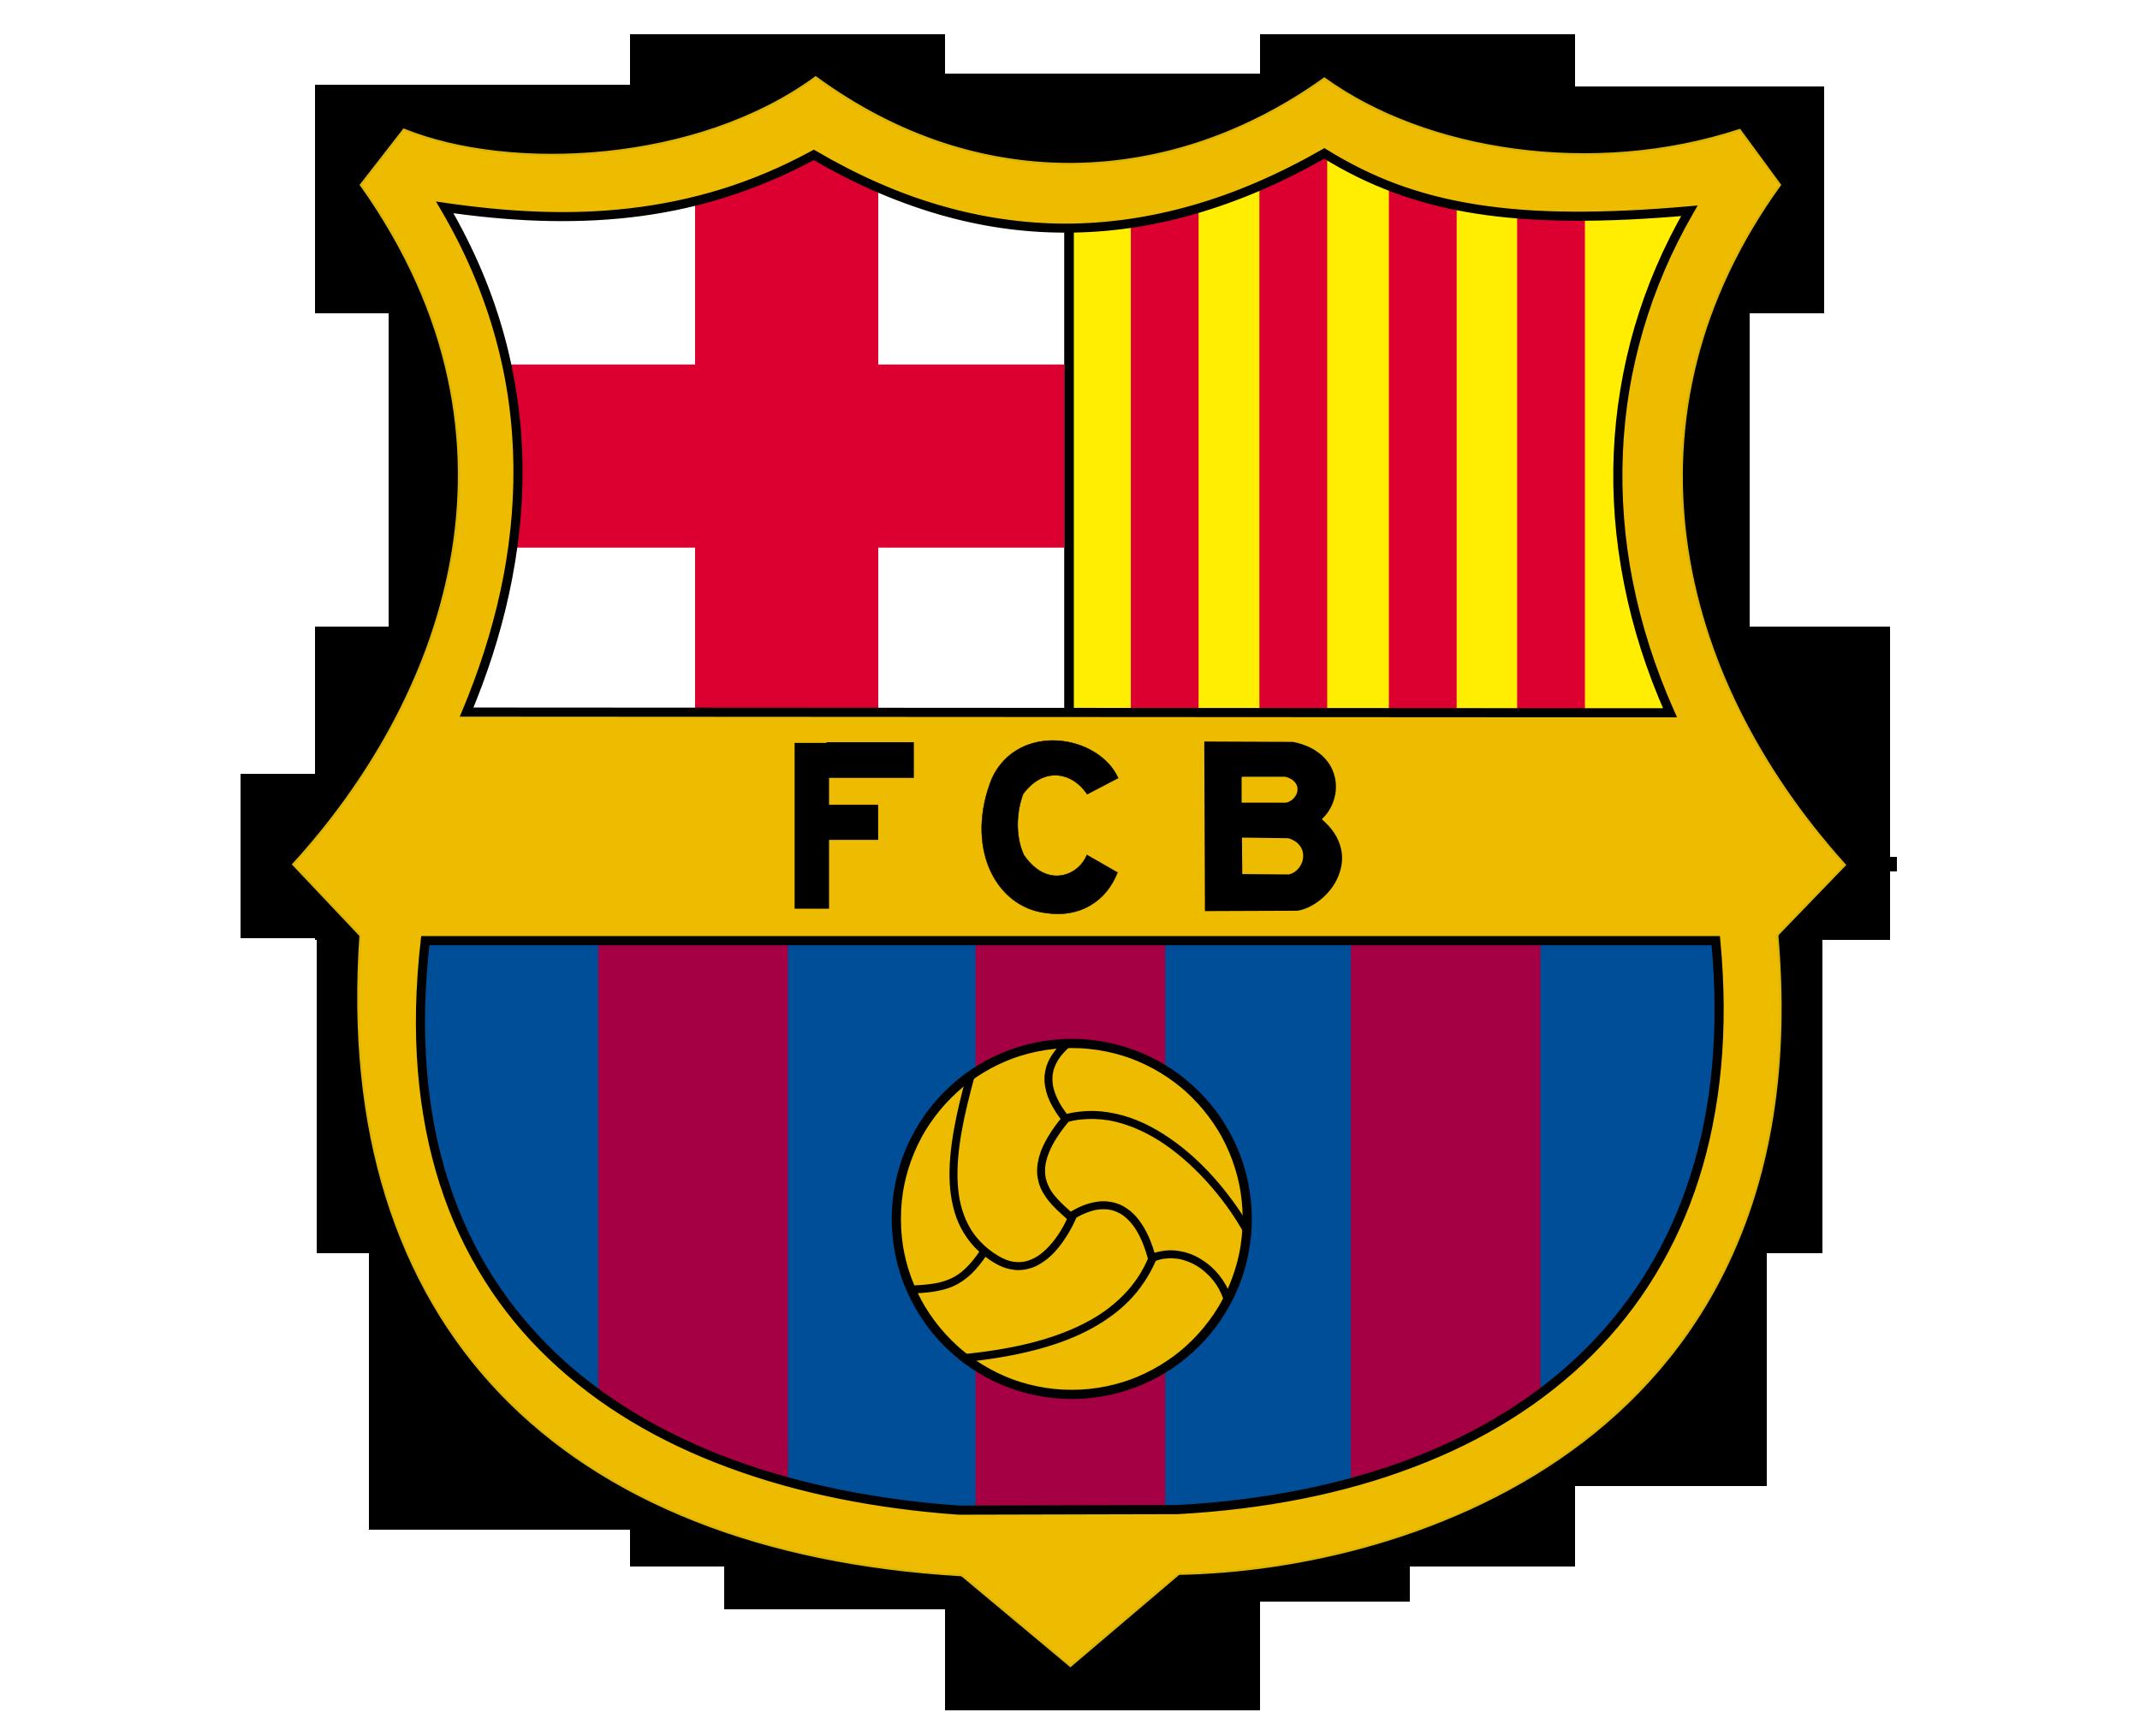 Fc barcelona logo histoire et signification evolution symbole fc barcelona - Logo club foot bresil ...